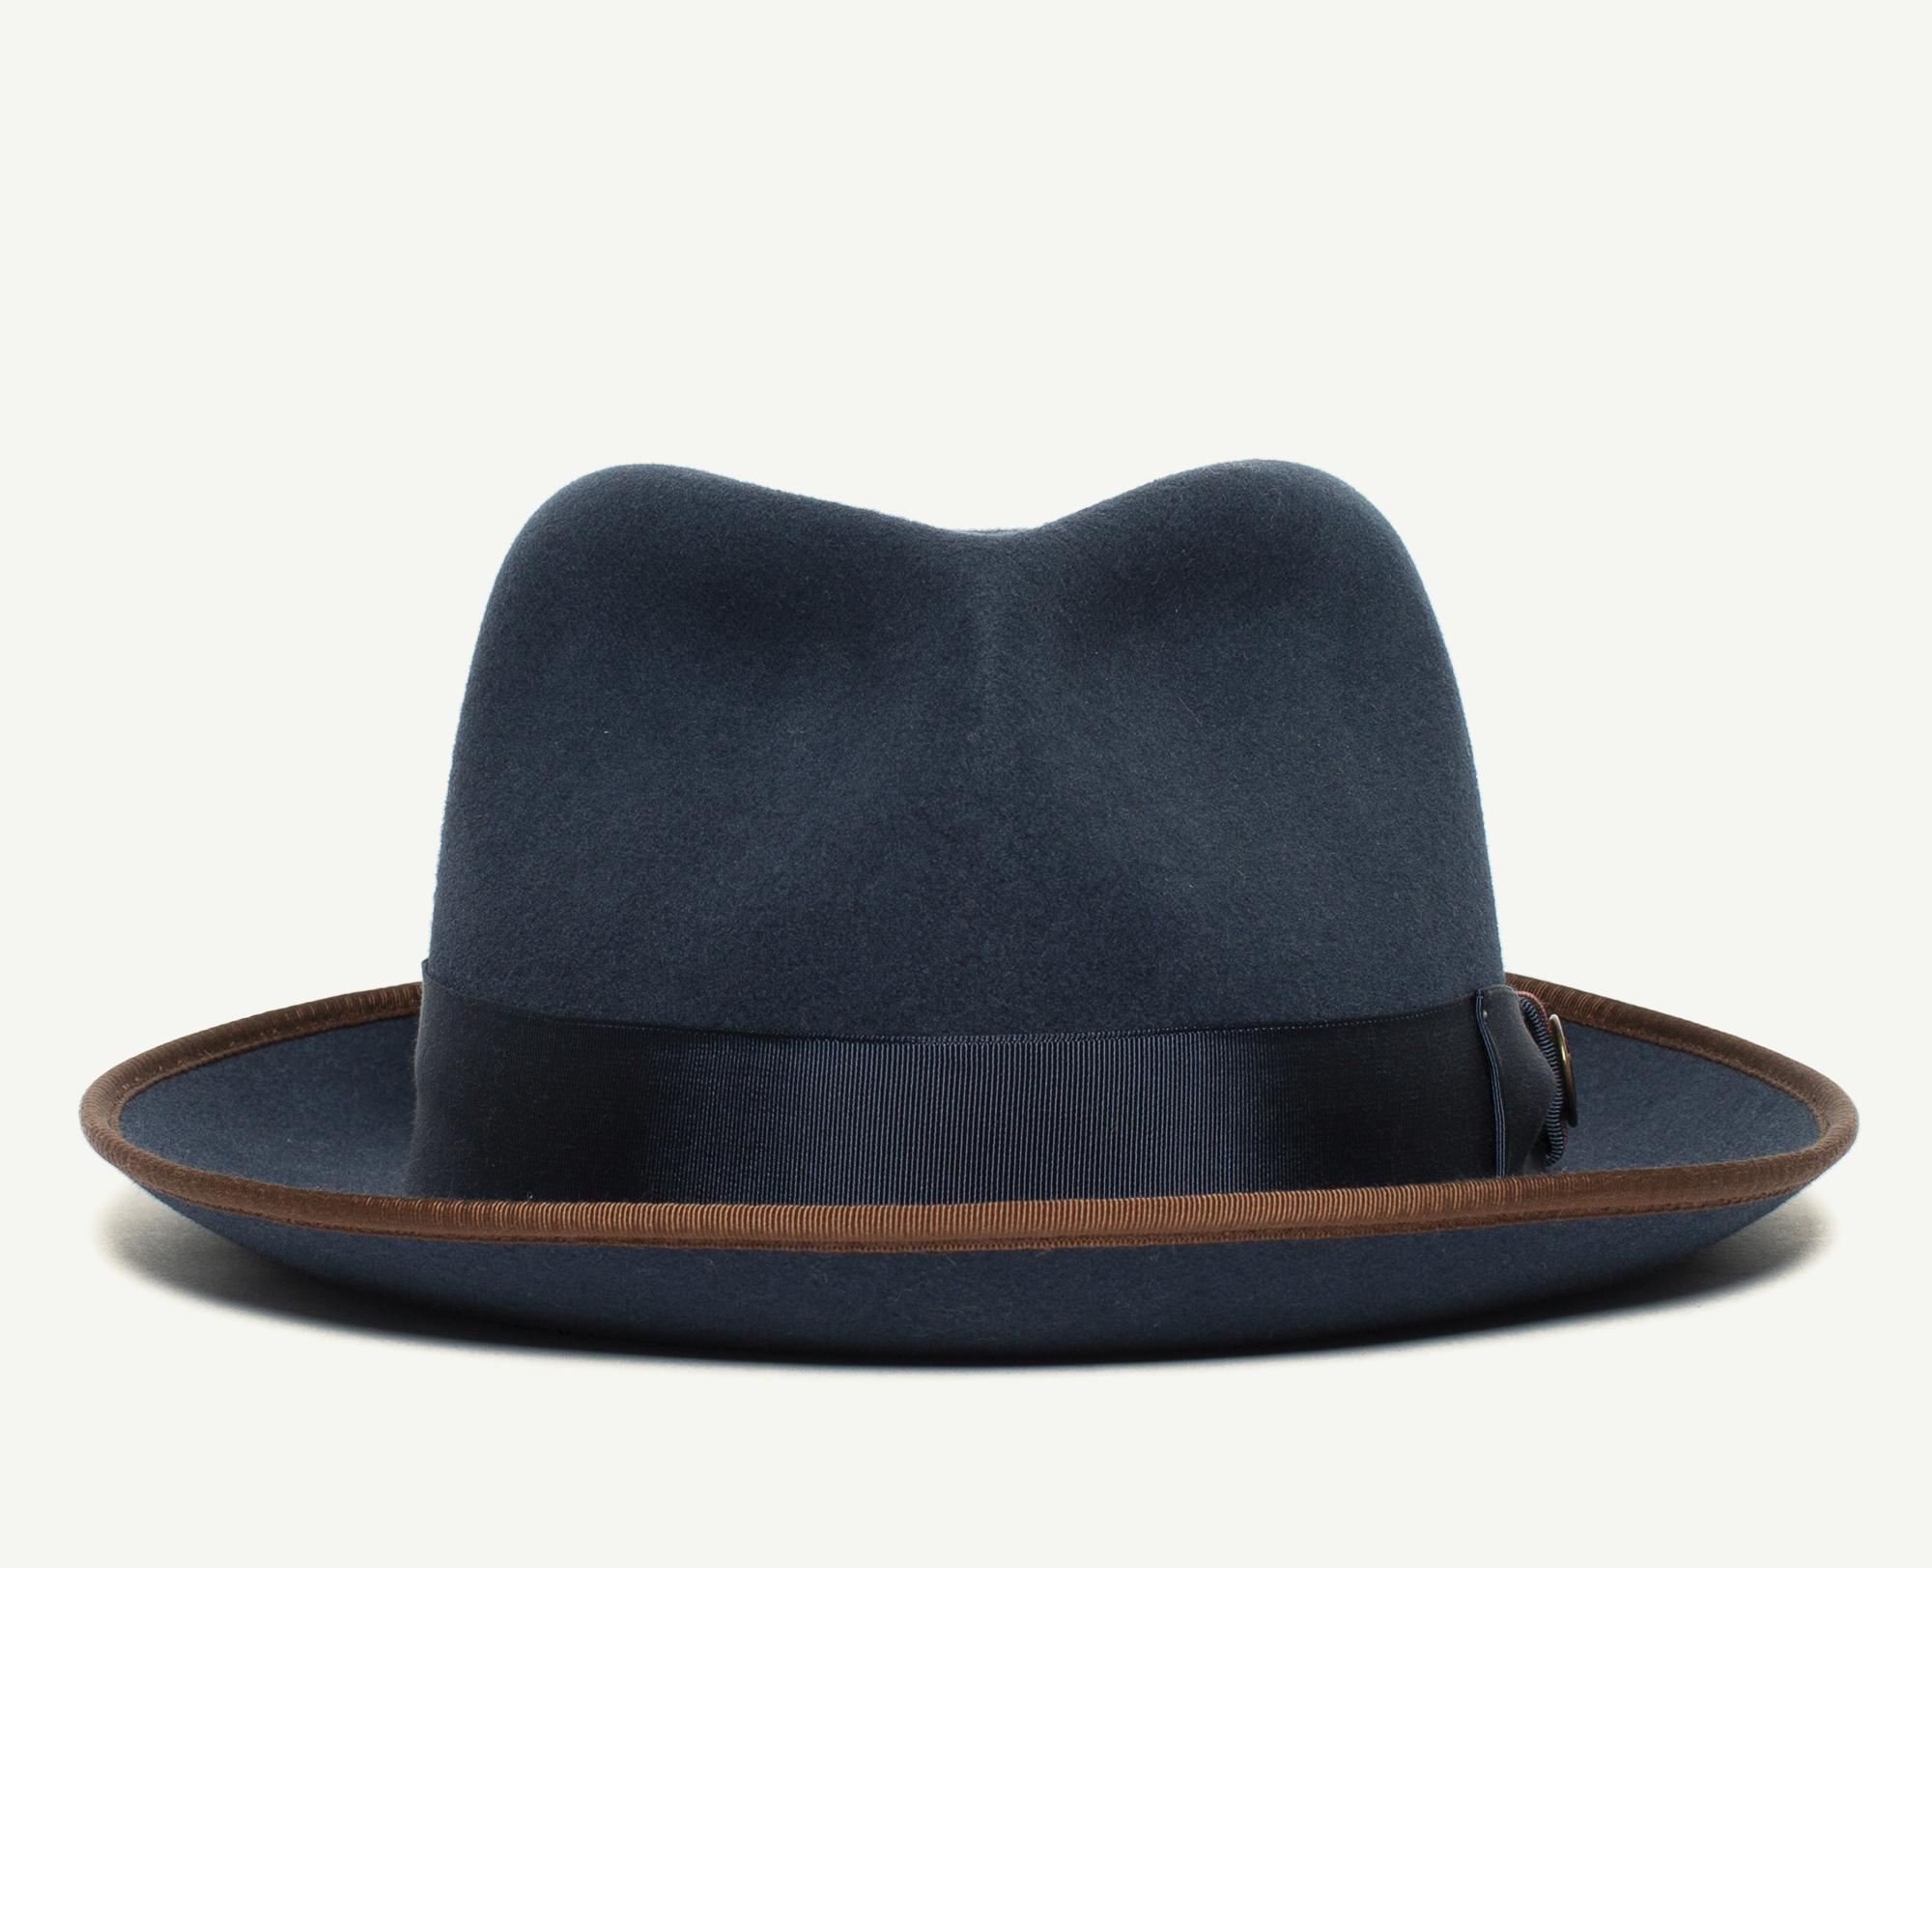 2bf3e26e Lozano wool diamond porkpie fedora hat with 2 1/4